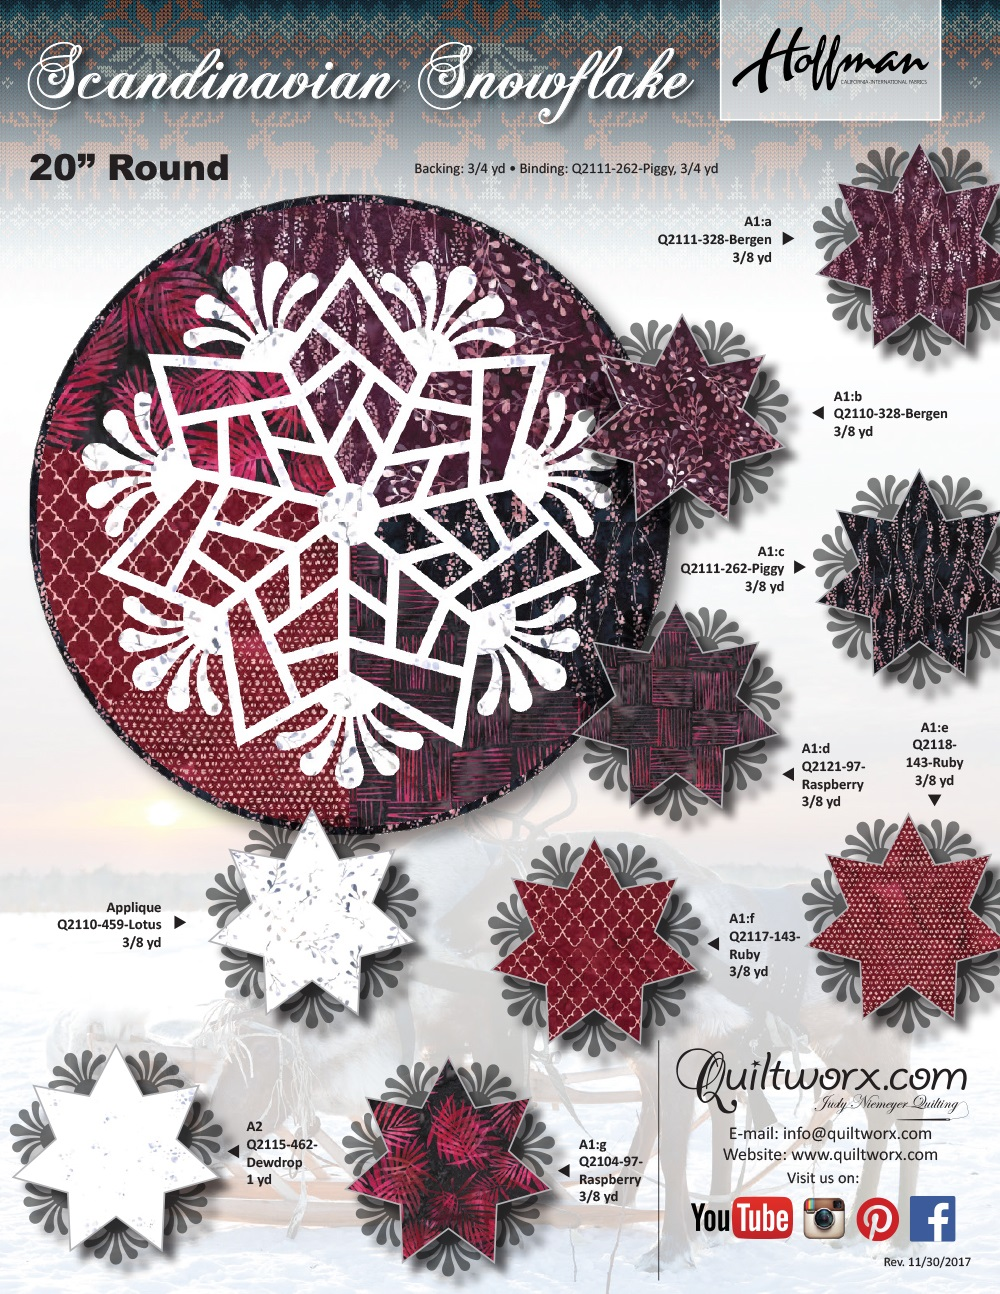 Scandinavian-Snowflake-(Purple)-Hoffman-KS-1